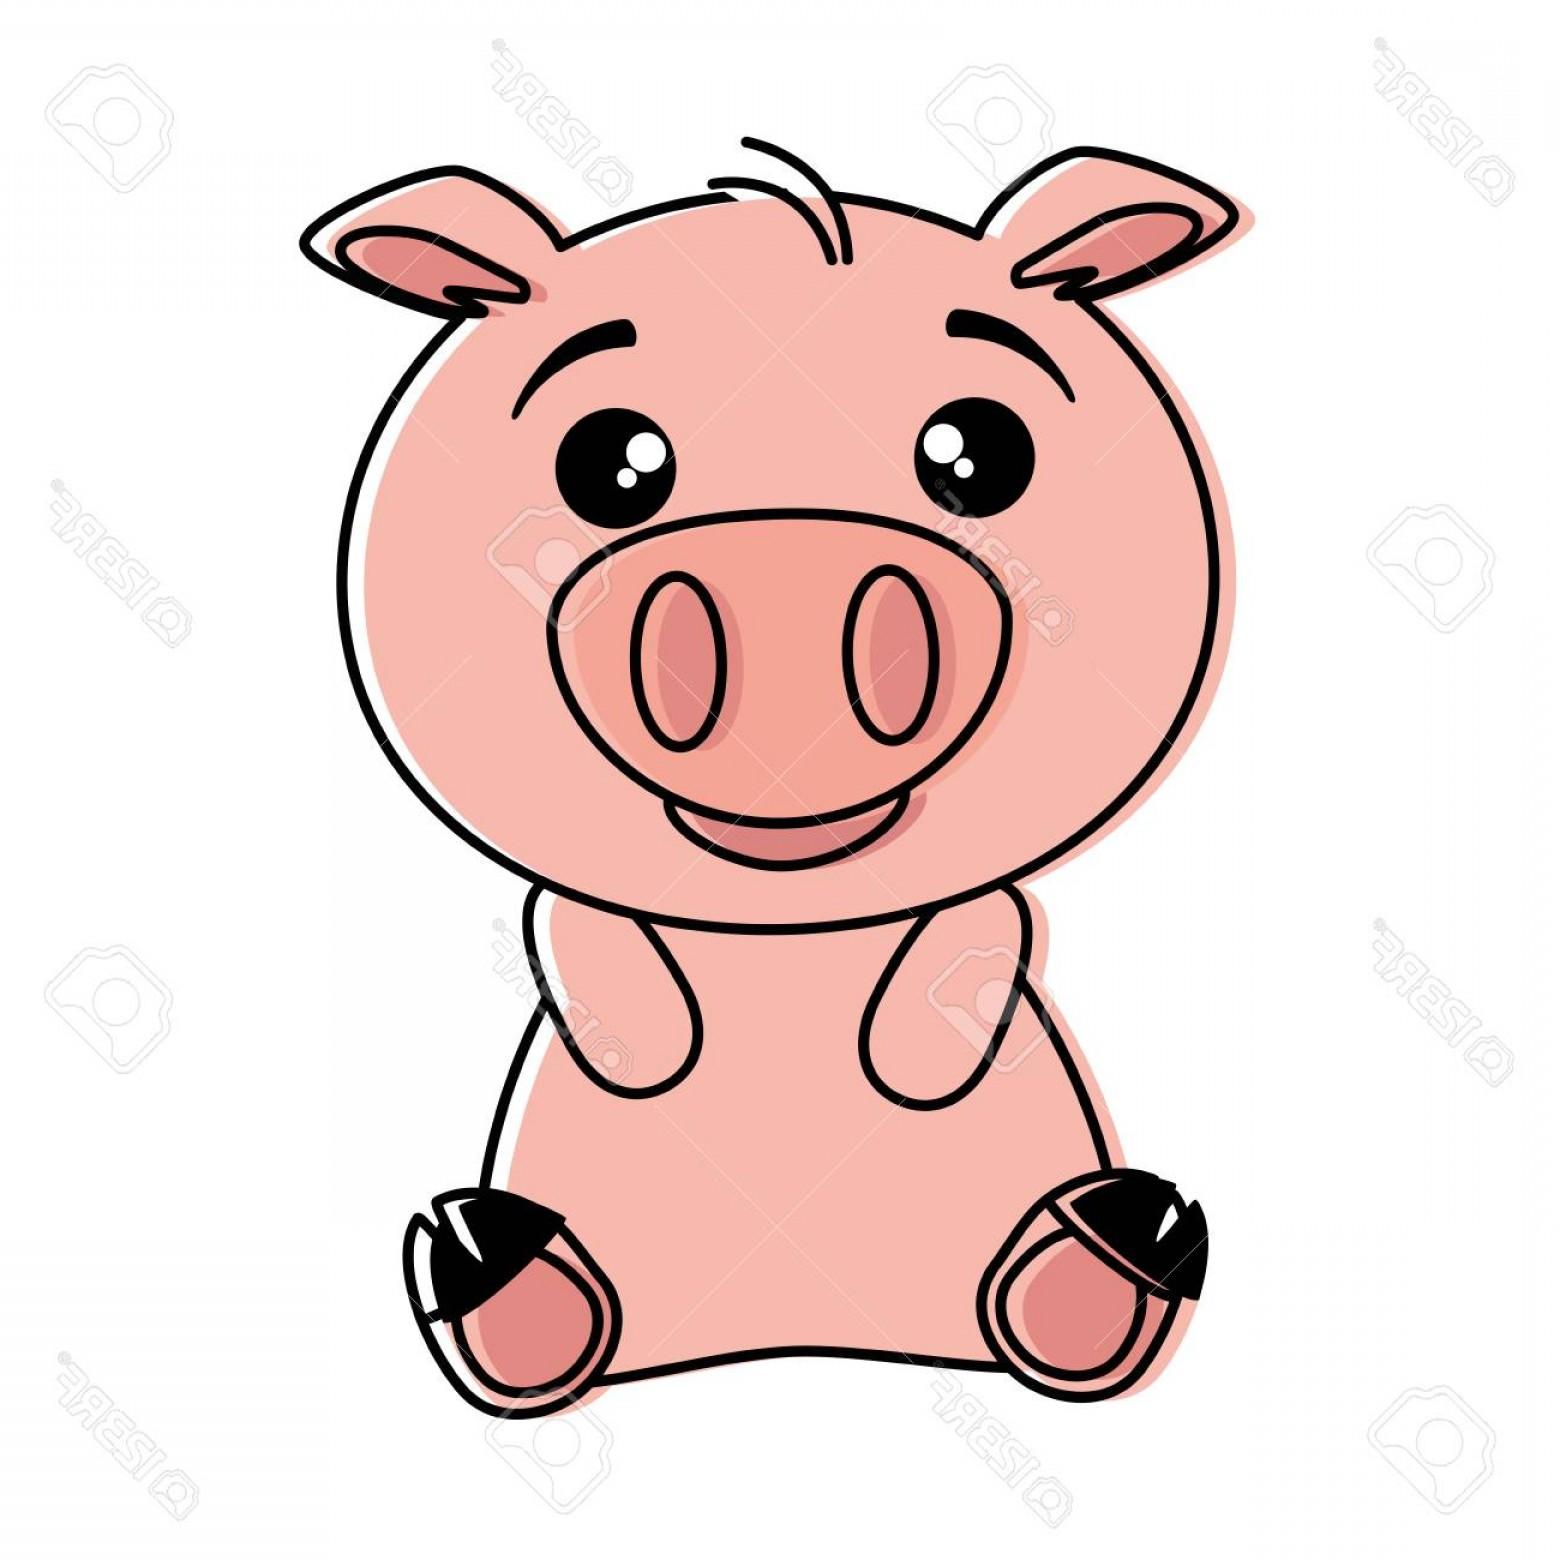 1560x1560 Photostock Vector Cute Pig Emoji Kawaii Vector Illustration Design